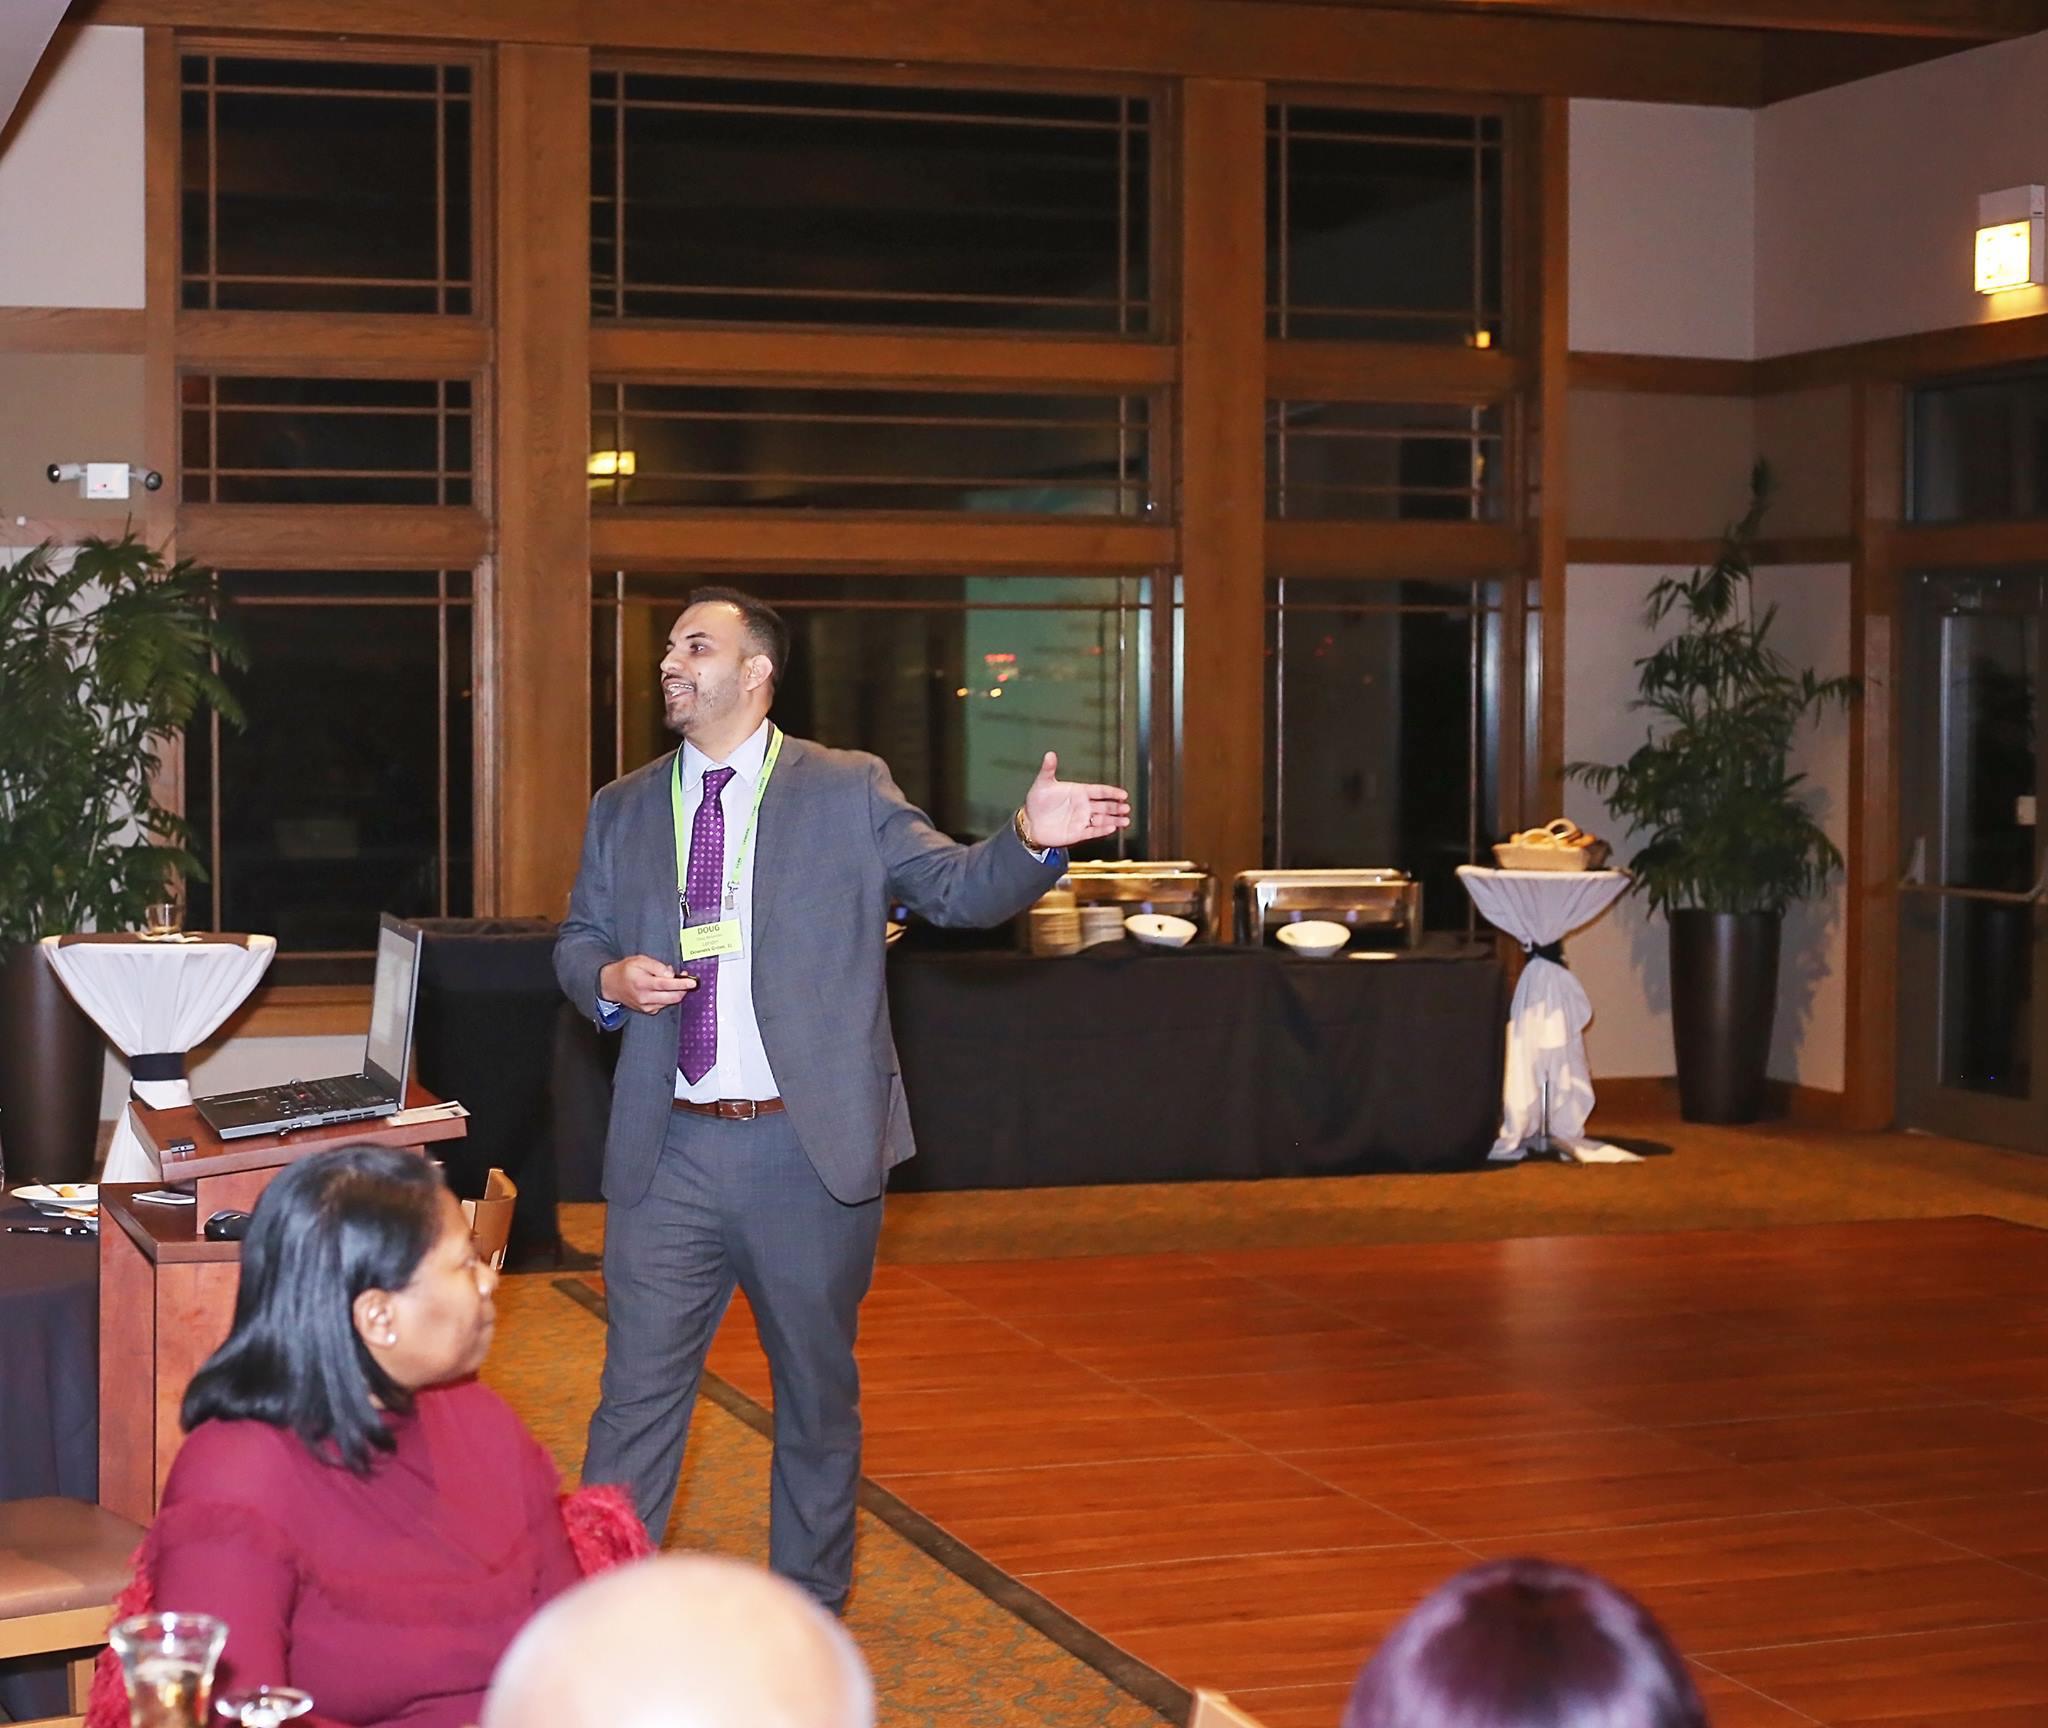 Doug Benavides at CrossCountry Mortgage, LLC - Duplicate St. Charles (630)884-0067